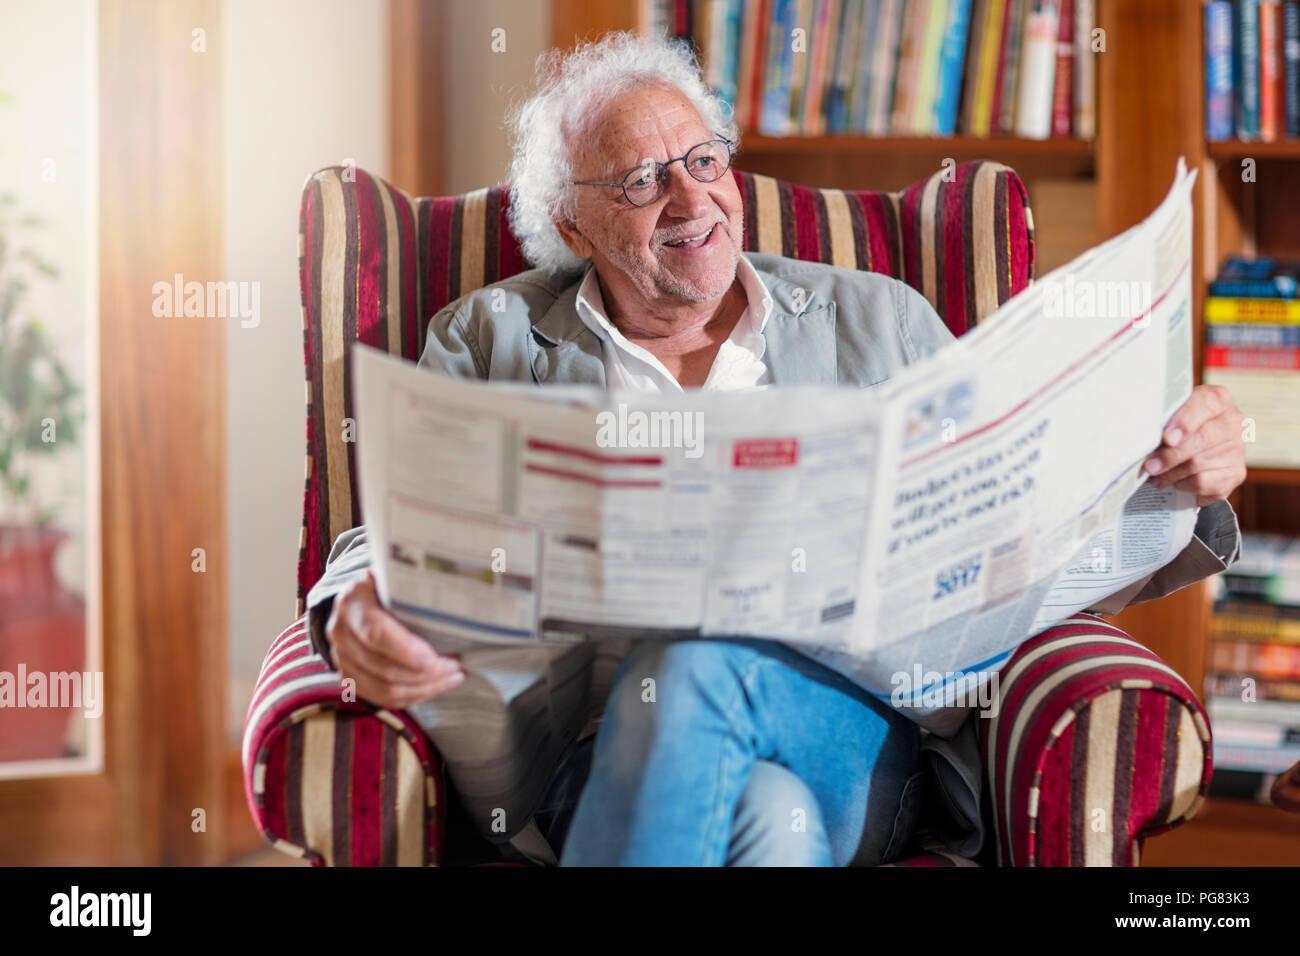 Where To Meet International Disabled Seniors In Fl